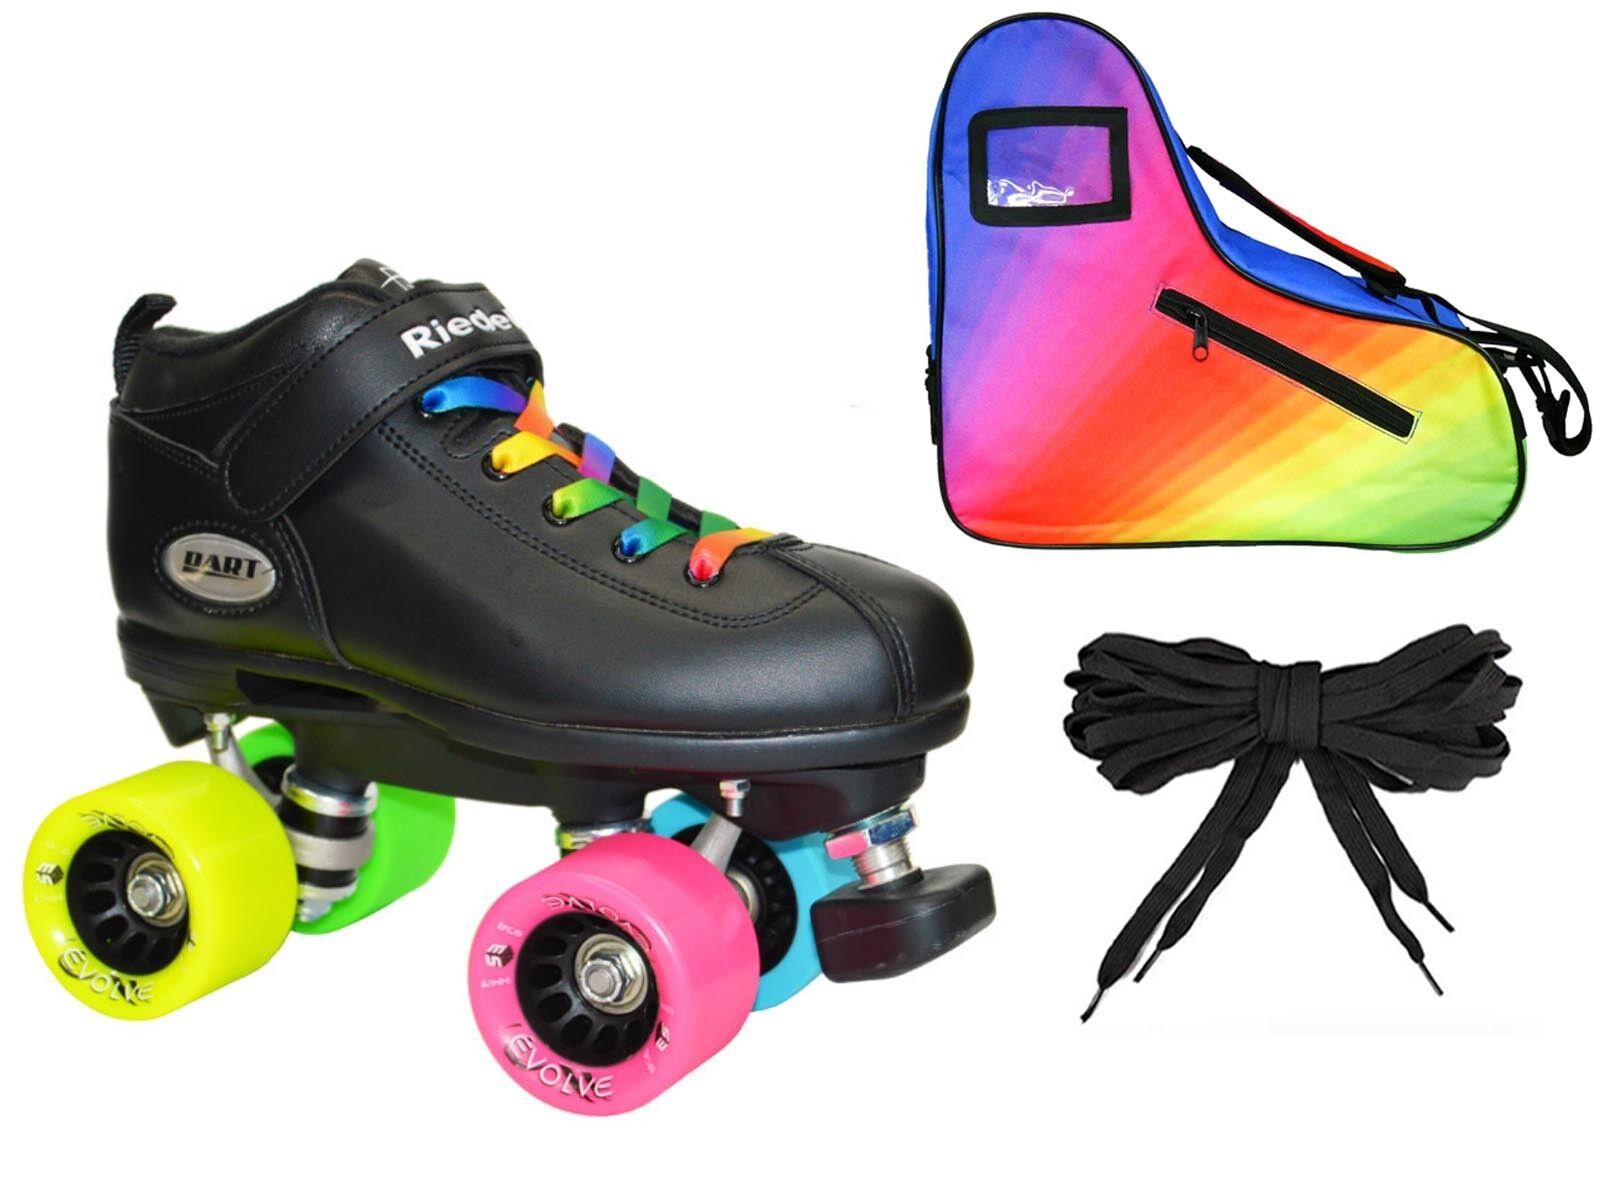 Riedell Dart Double Rainbow Quad Roller Derby  Speed S  LE Rainbow Bag Bundle  no minimum